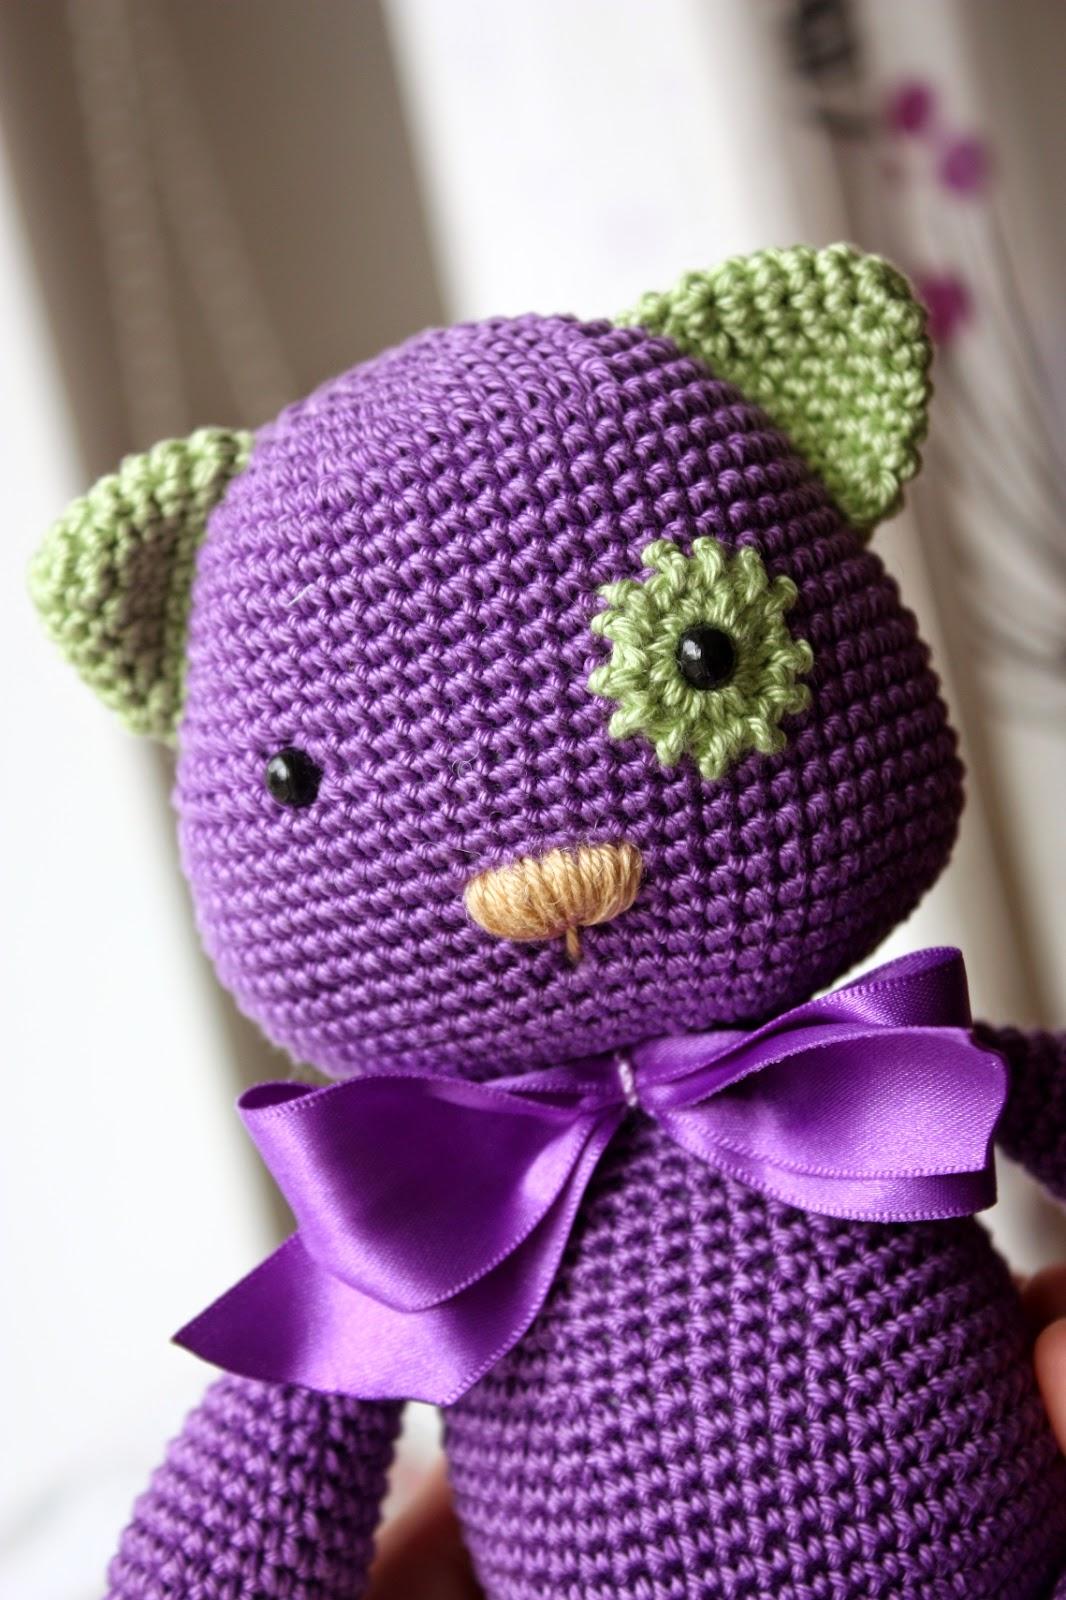 HAPPYAMIGURUMI: A New Pattern out now: Amigurumi Cat Pattern